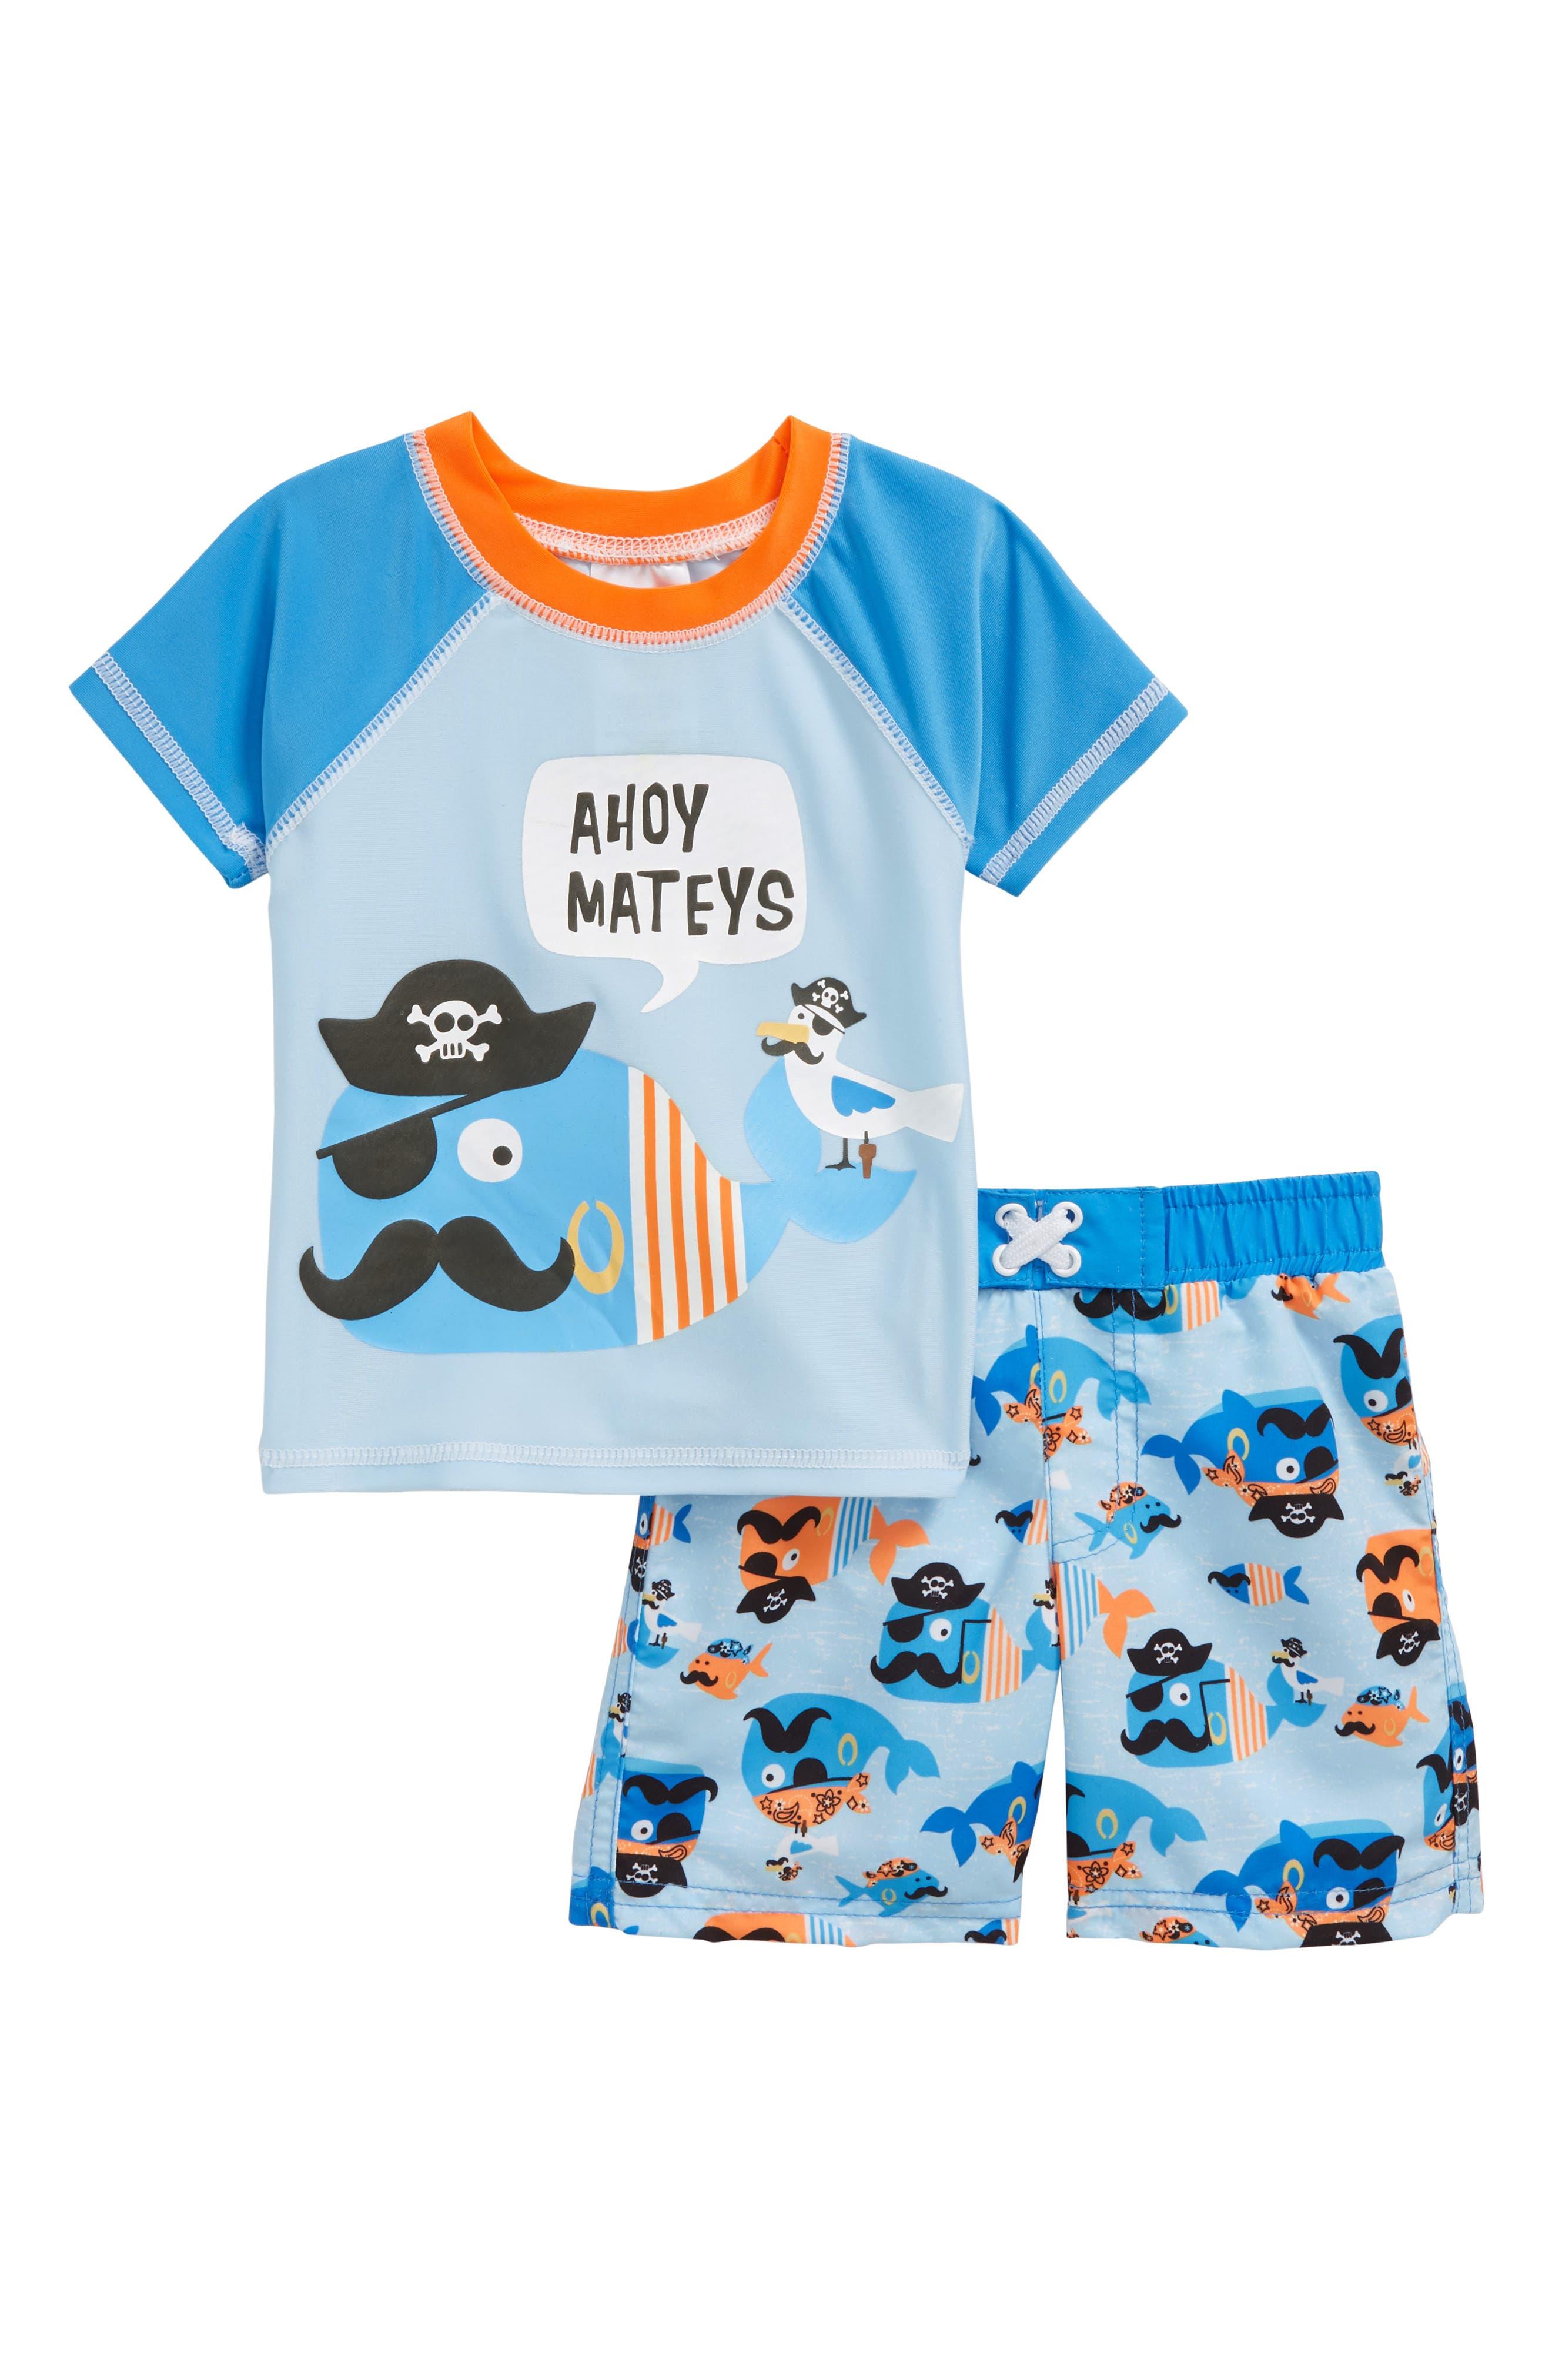 Ahoy Mateys Two-Piece Rashguard Swimsuit,                         Main,                         color, 499